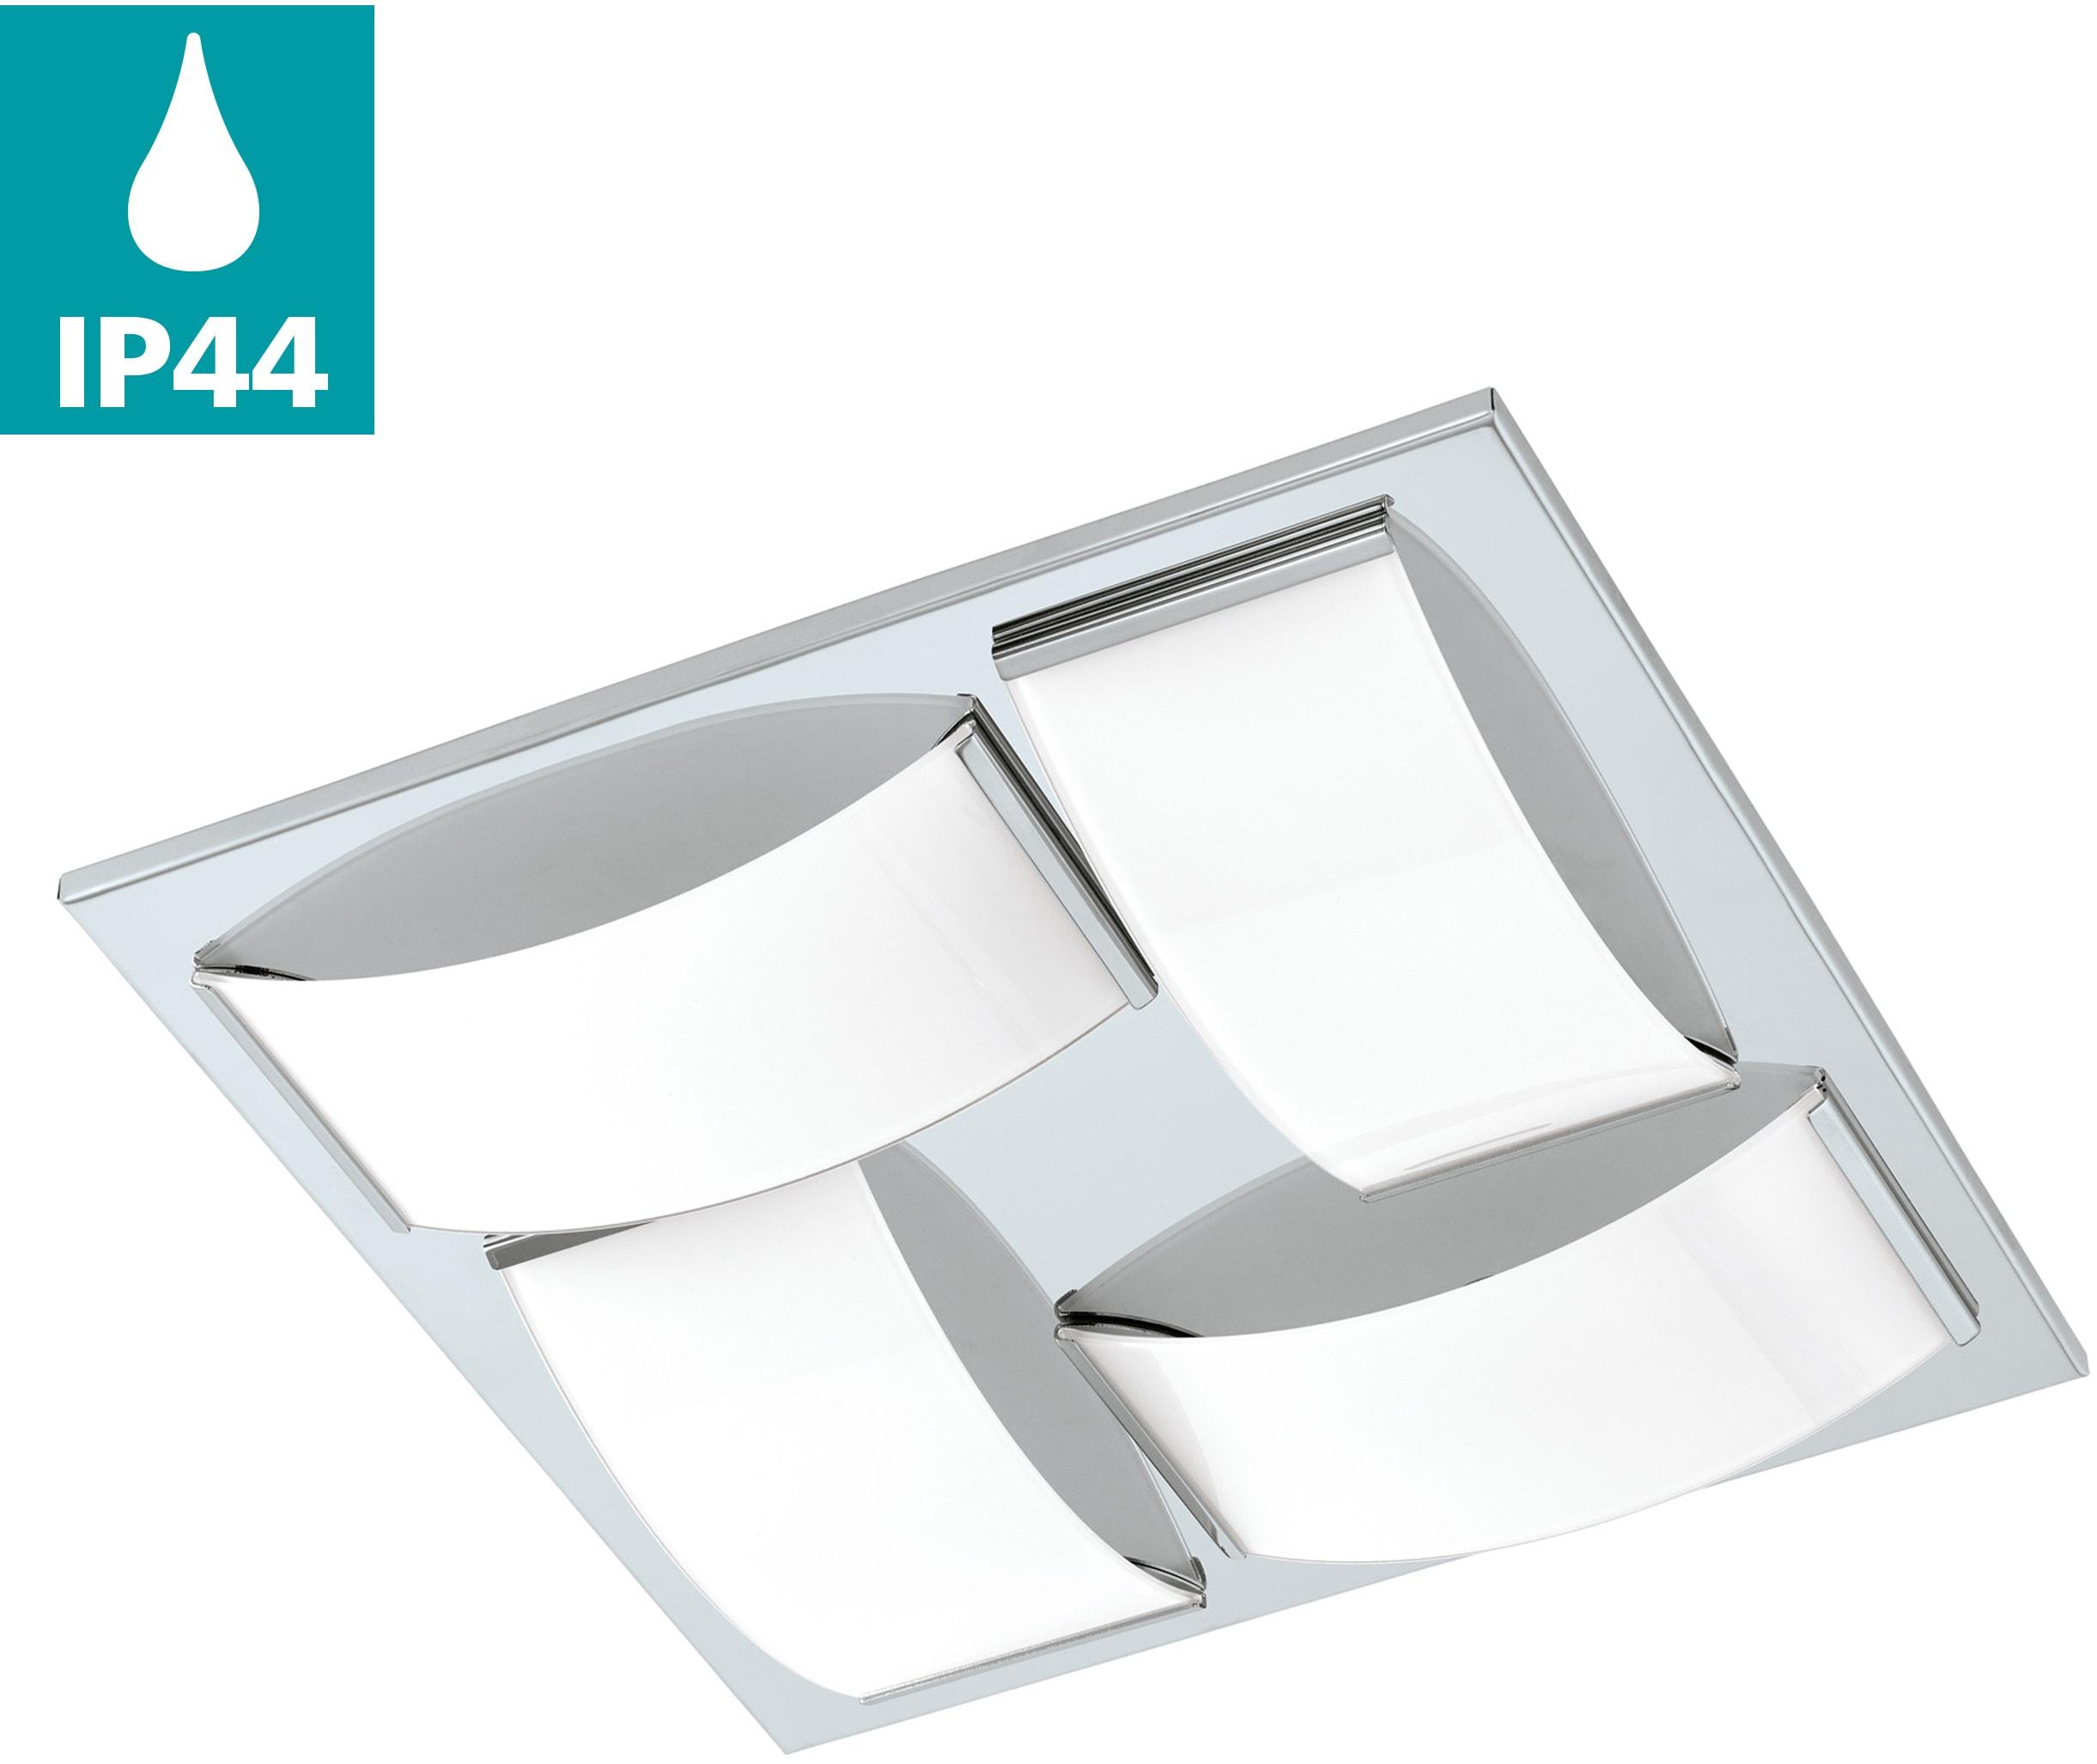 EGLO LED Deckenleuchte WASAO1, LED-Board, Warmweiß, LED tauschbar